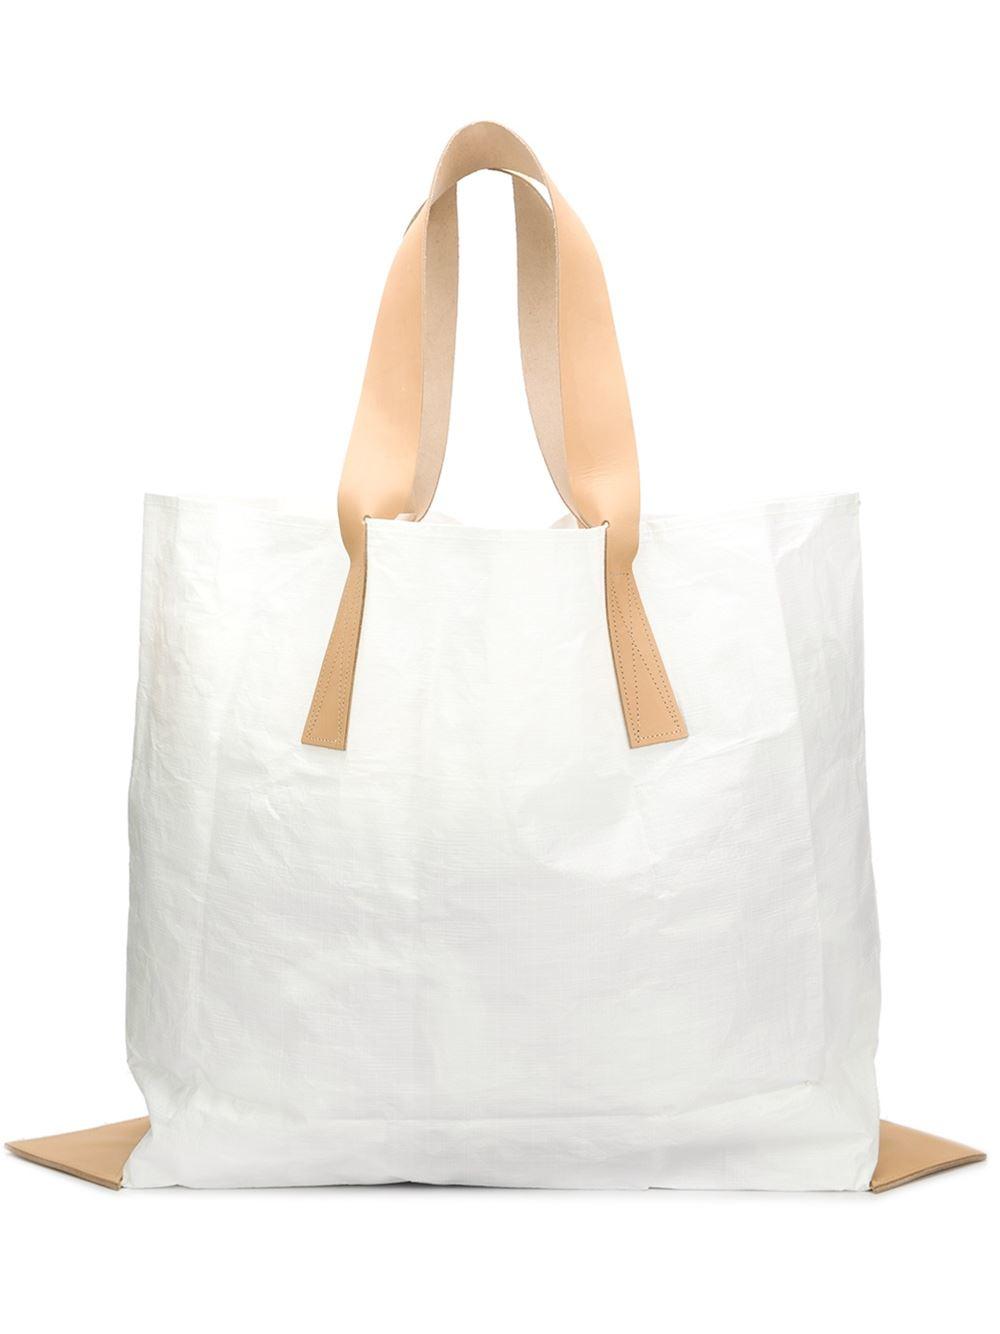 Lyst Hender Scheme Handles Vinyl Slouchy Tote Bag In White